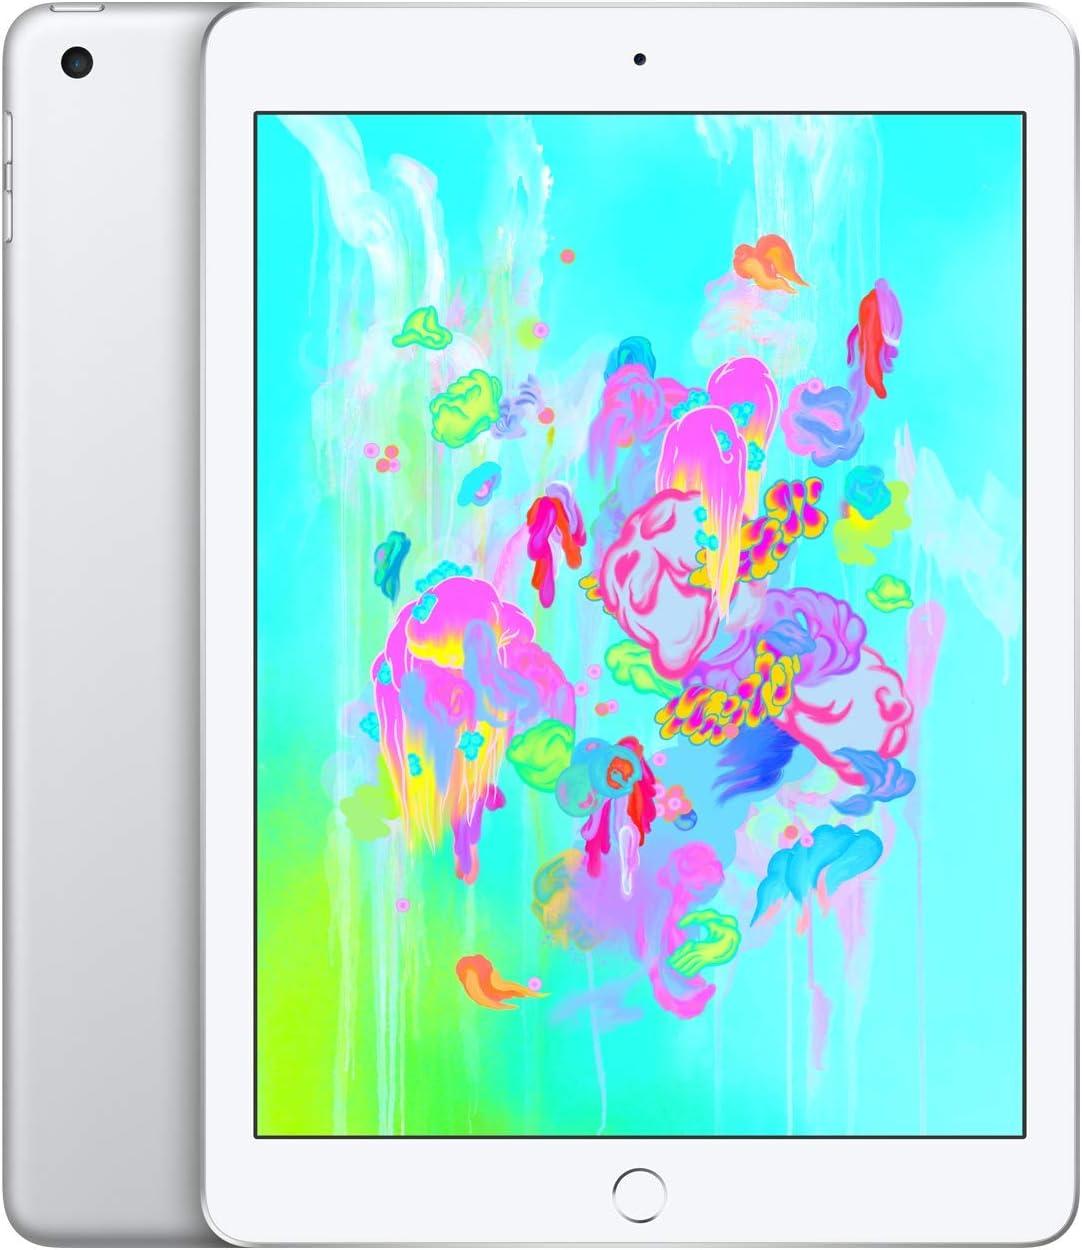 Apple iPad (Wi-Fi, 128GB) - Silver (Latest Model)